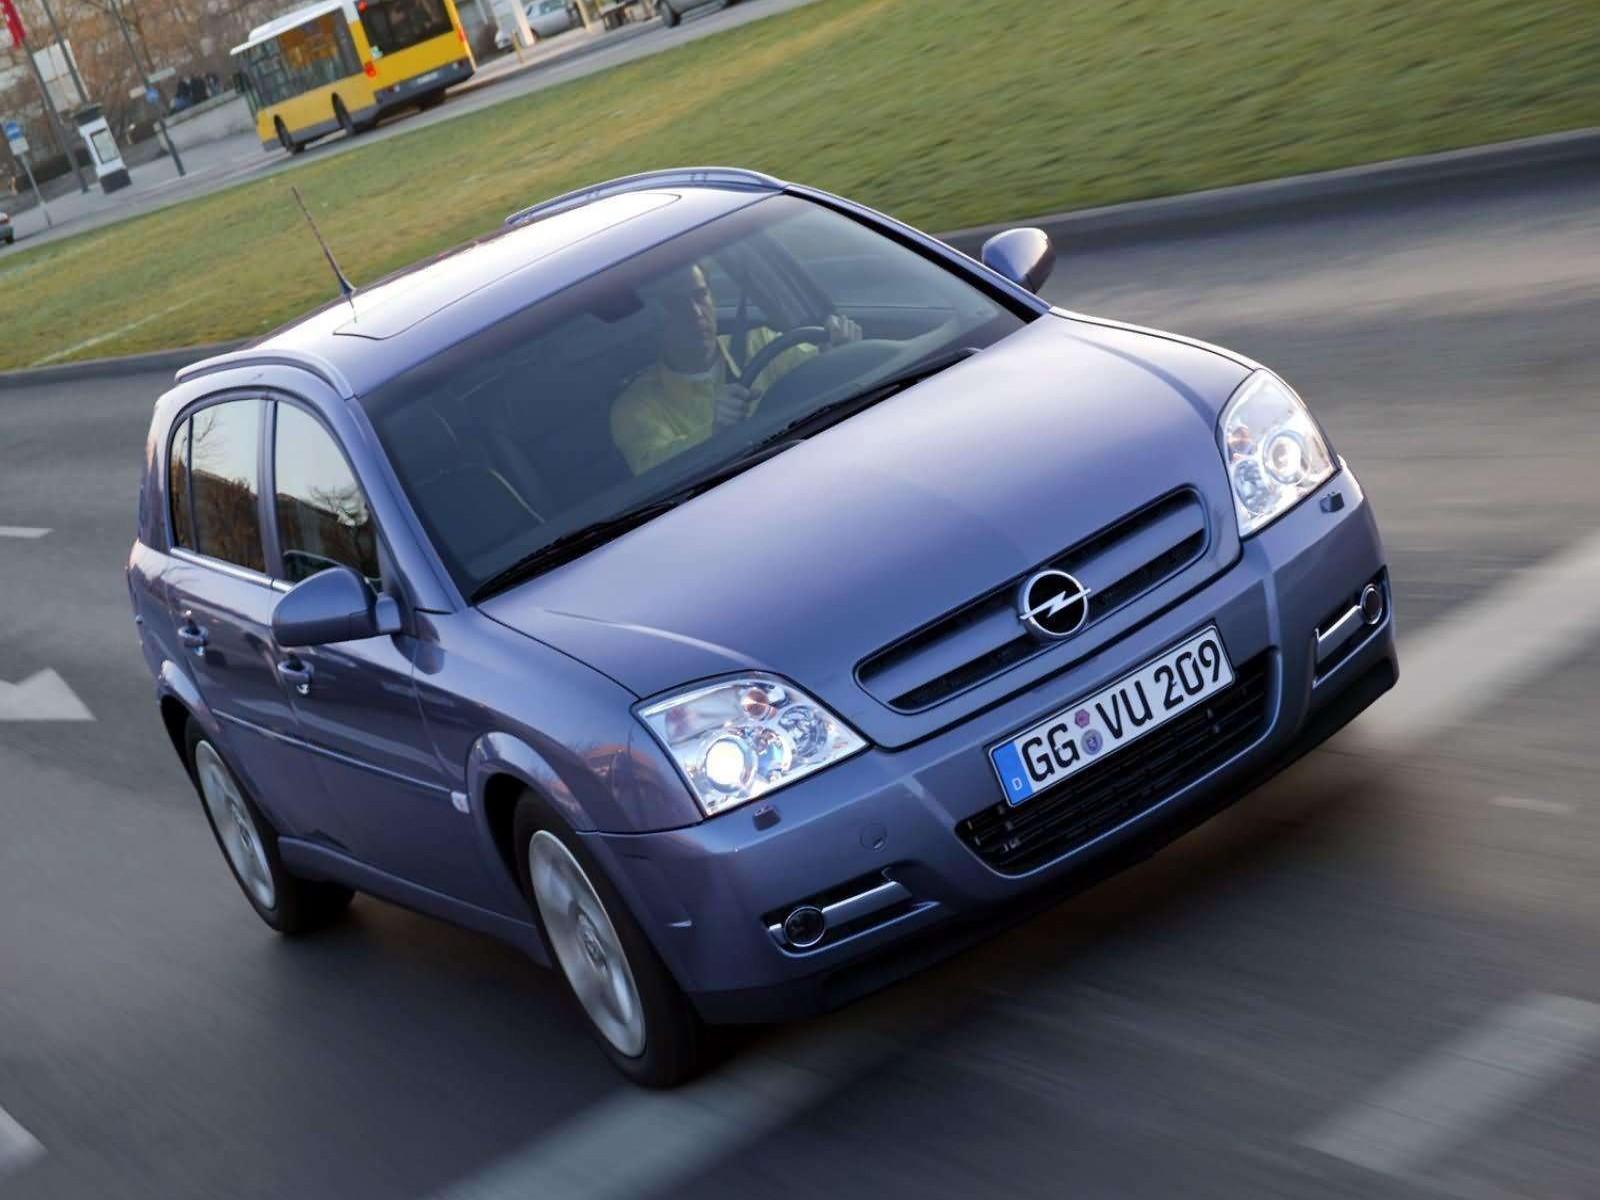 Car and car zone opel signum v6 cdti 2003 new cars car reviews opel signum v6 cdti 2003 vanachro Images